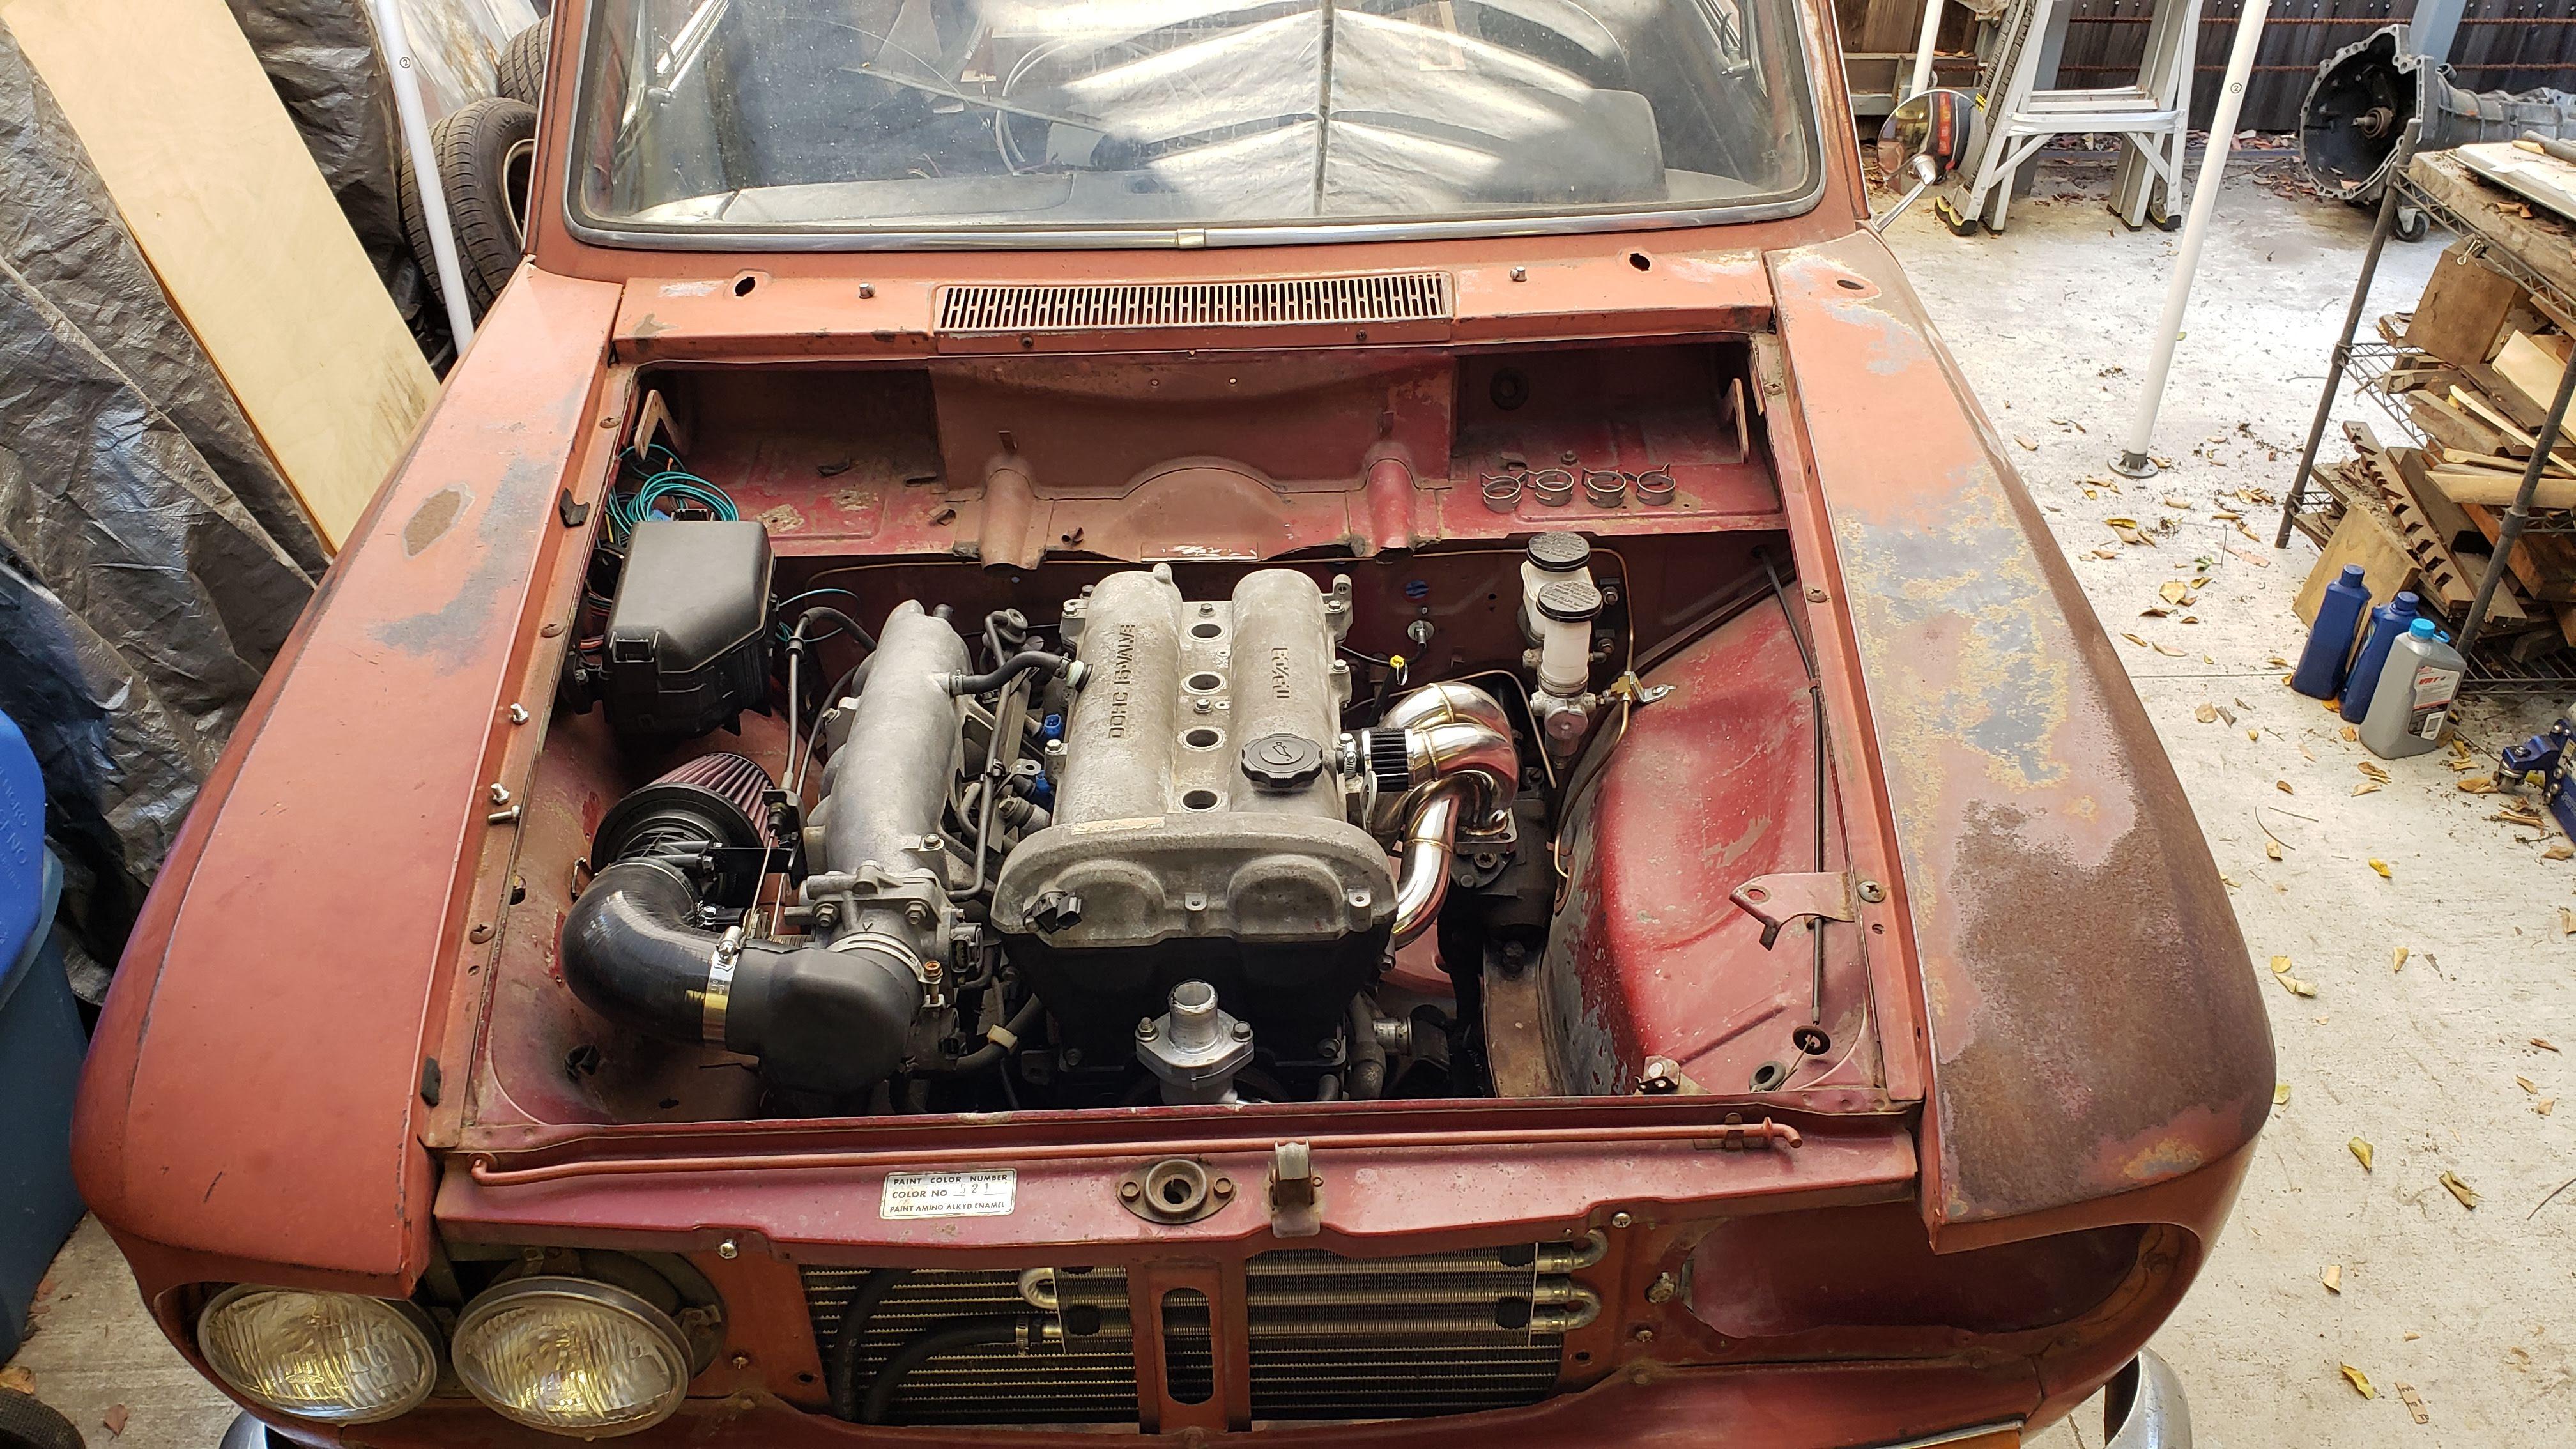 wagon_b6_engine_progress.jpg